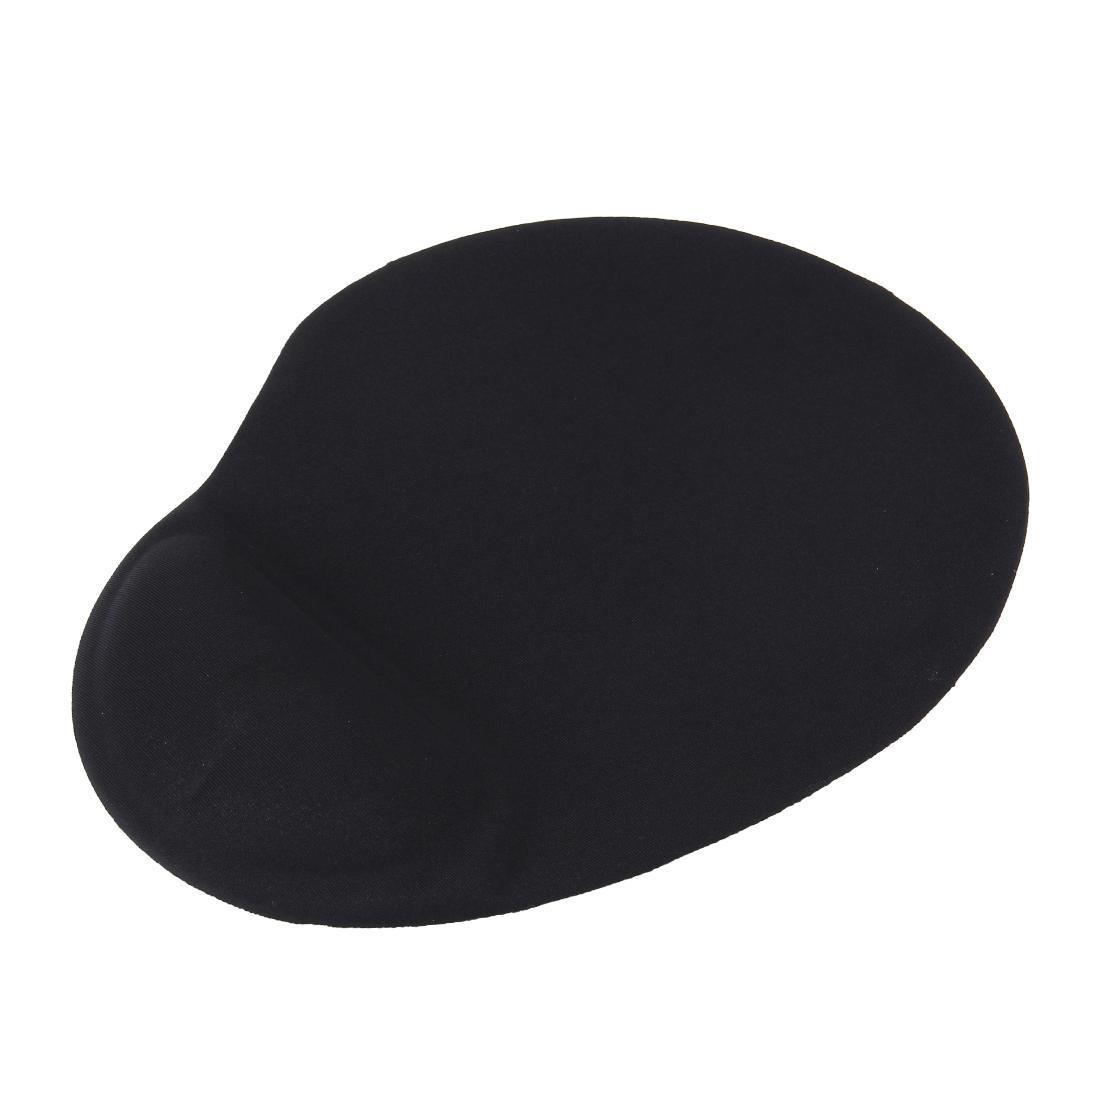 Mousepad Mobilis H-18 με Gel Ξεκούρασης του Καρπού. Μαύρο